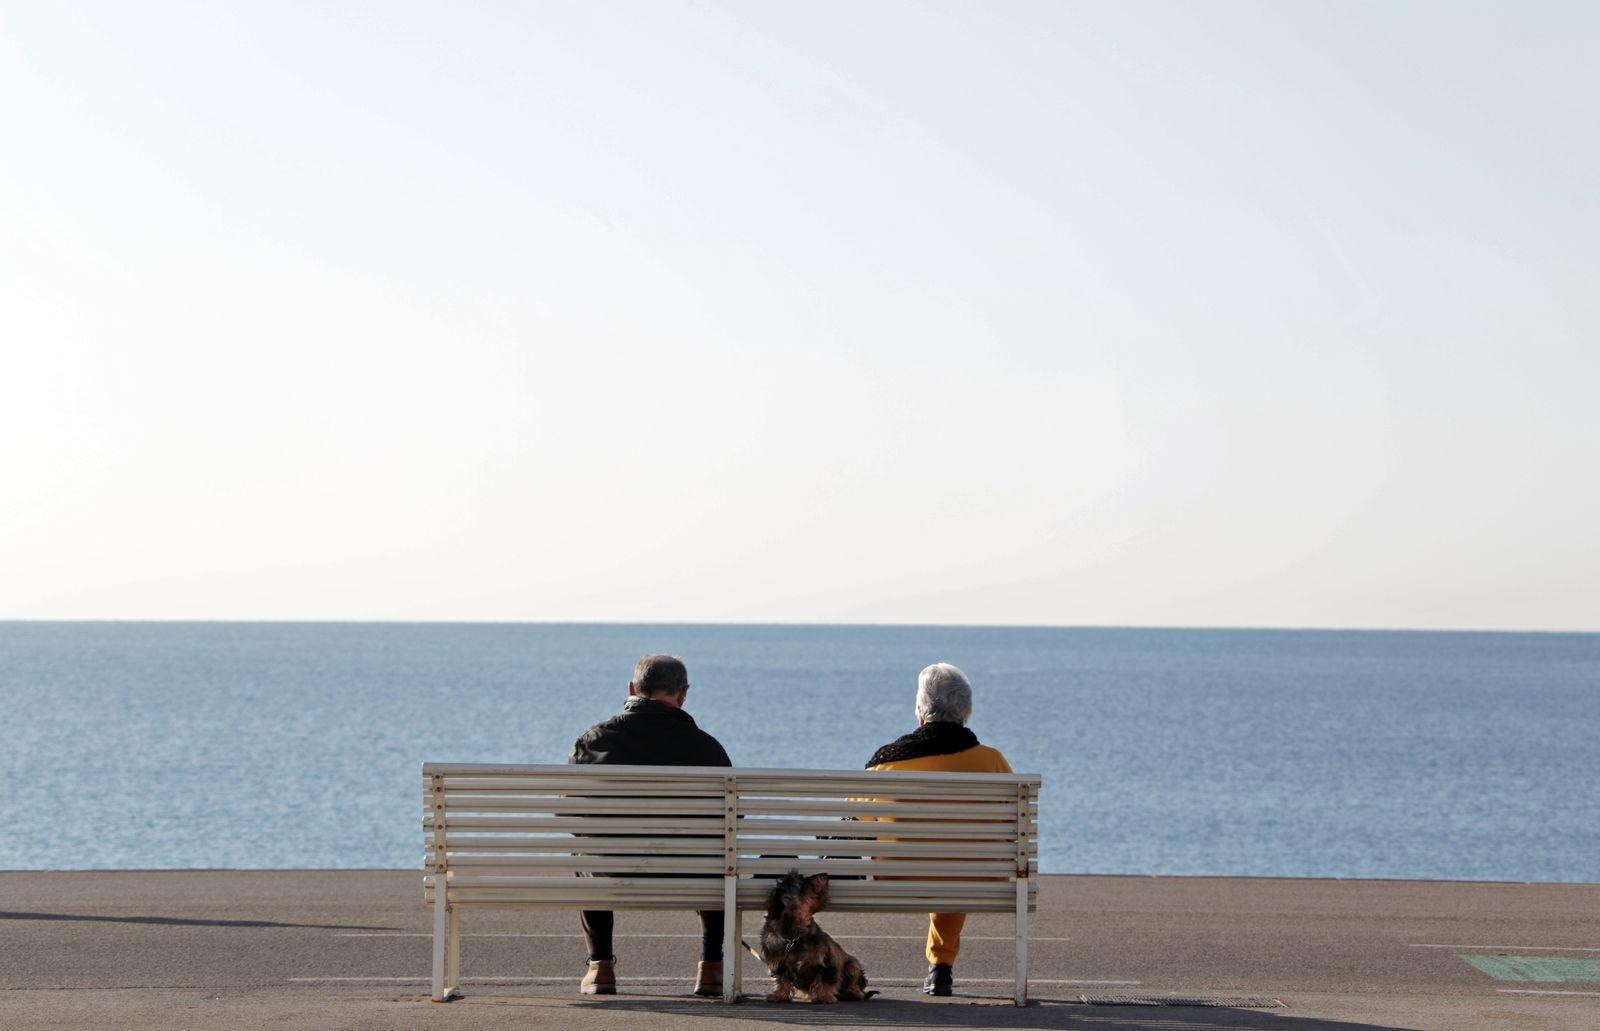 Senioren Mittelmeer Rente Rentner